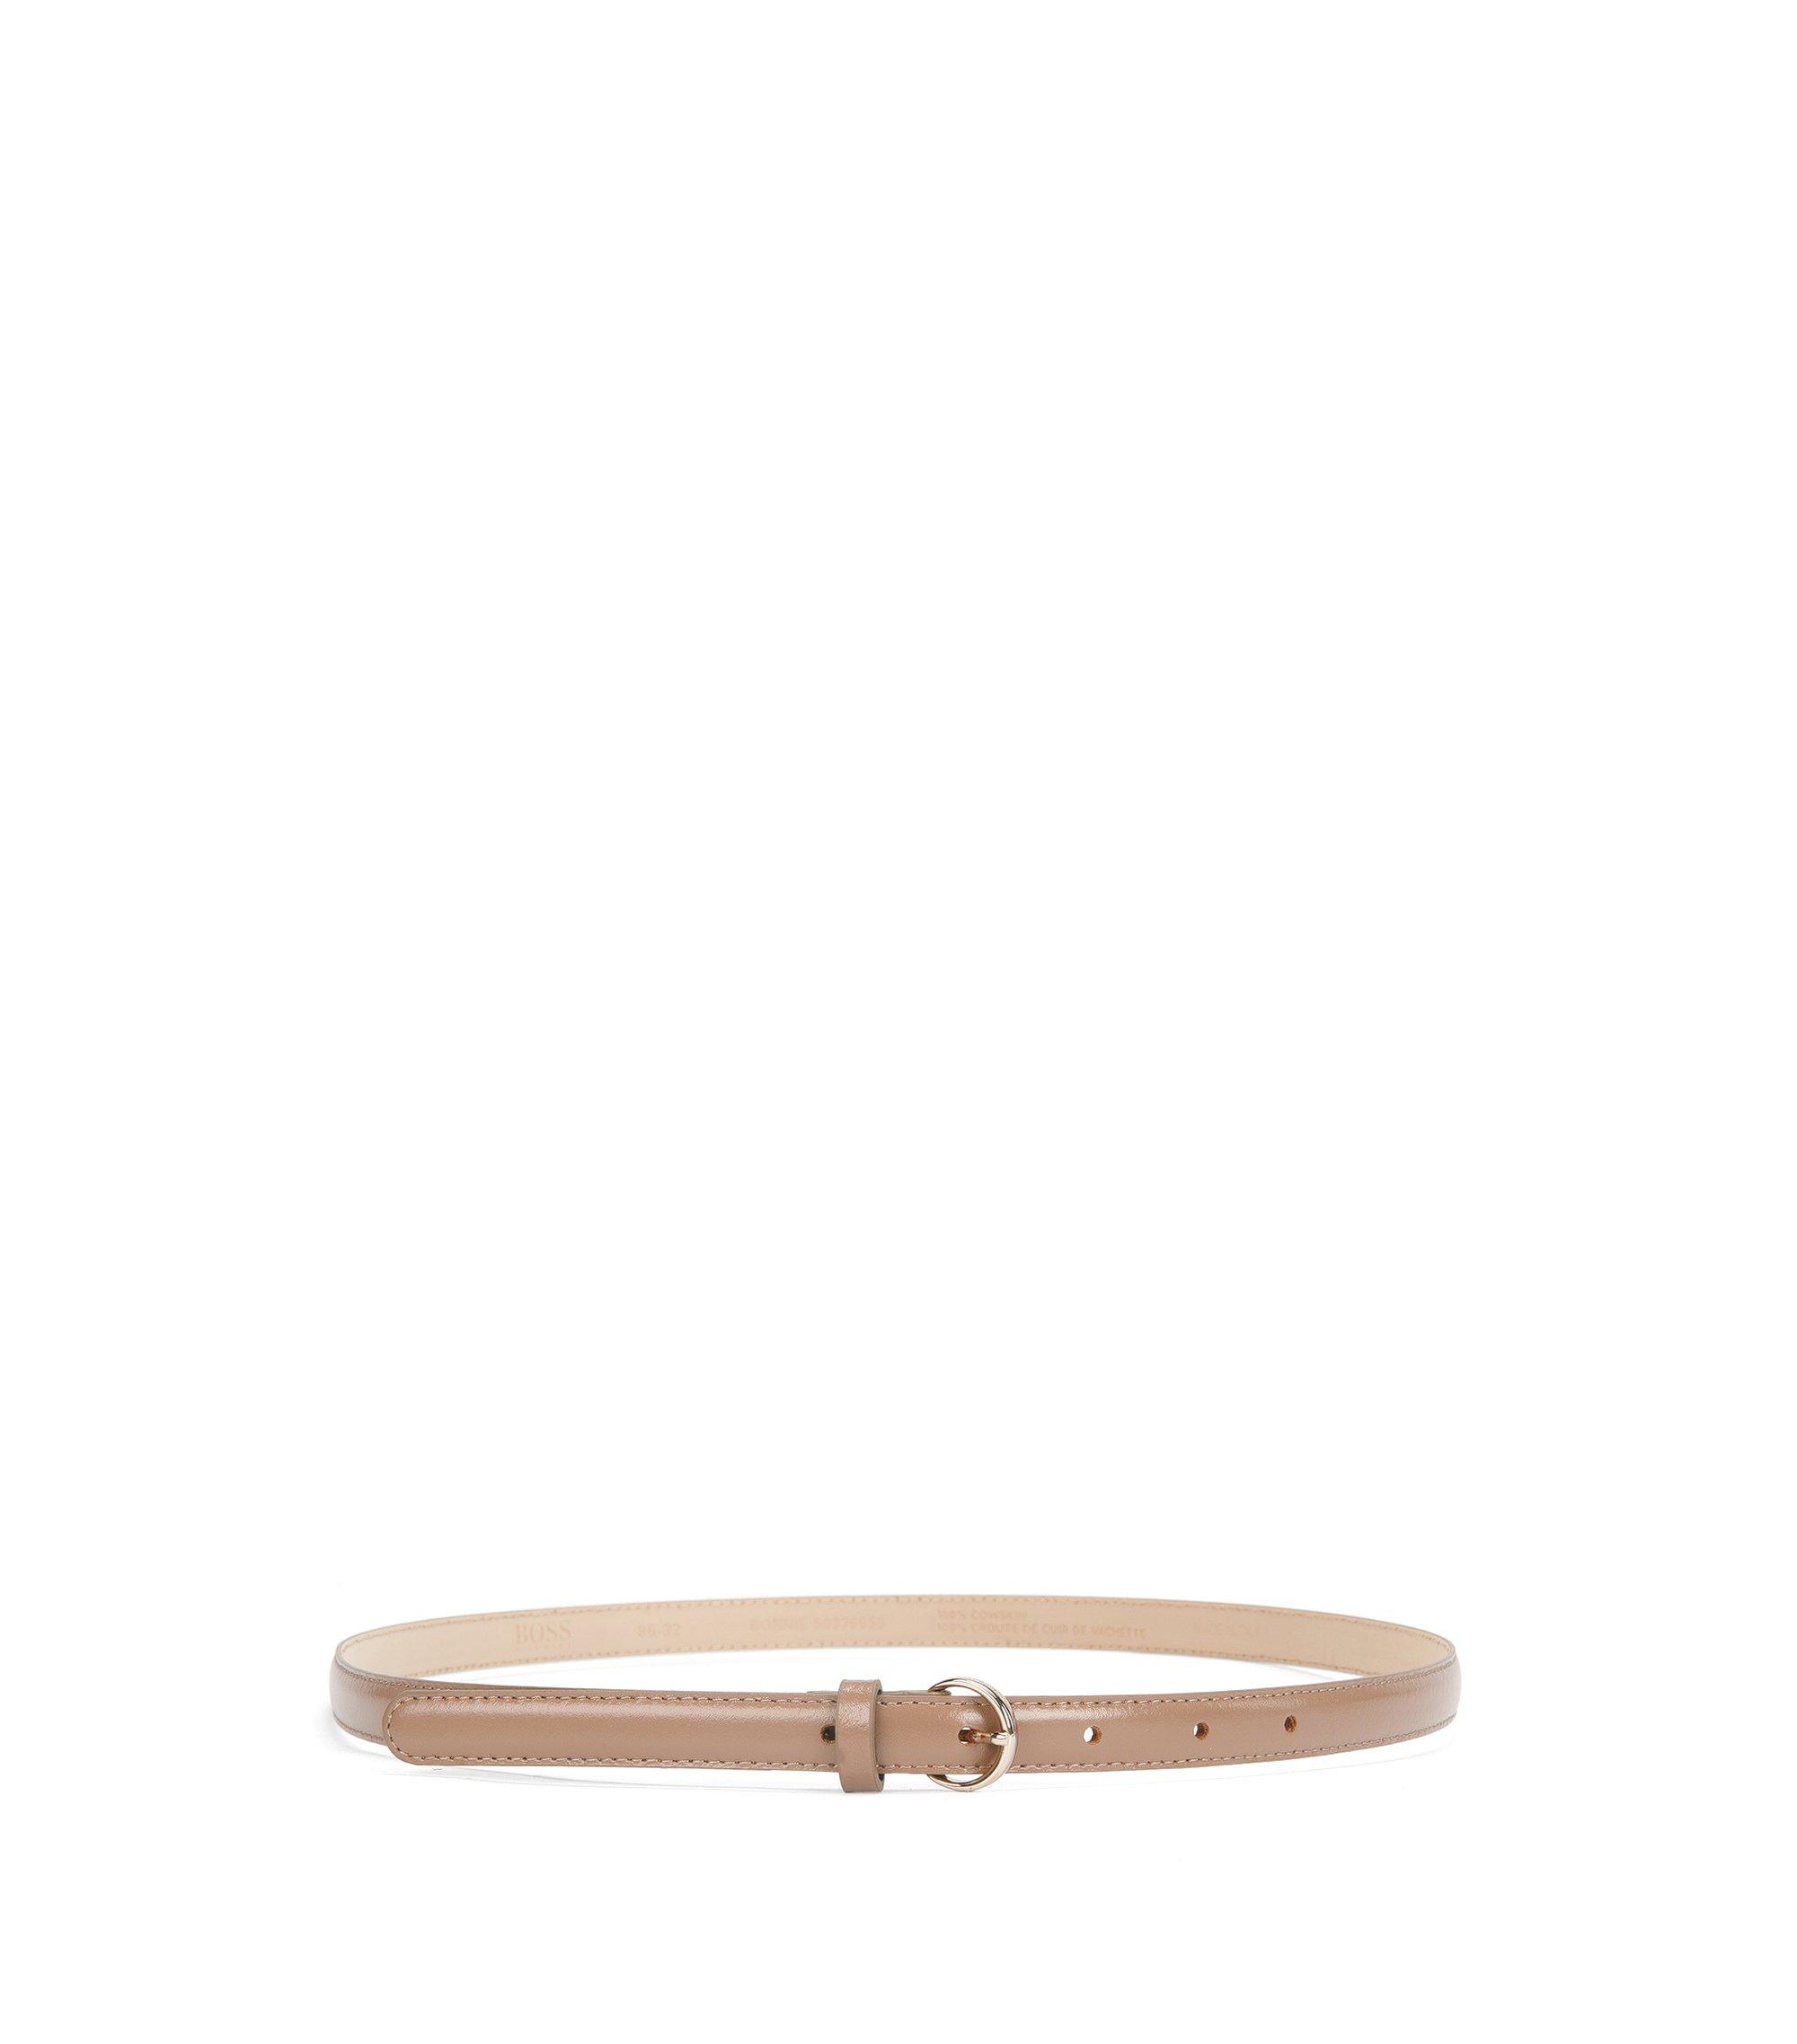 Skinny Leather Belt   Bonnie, Beige